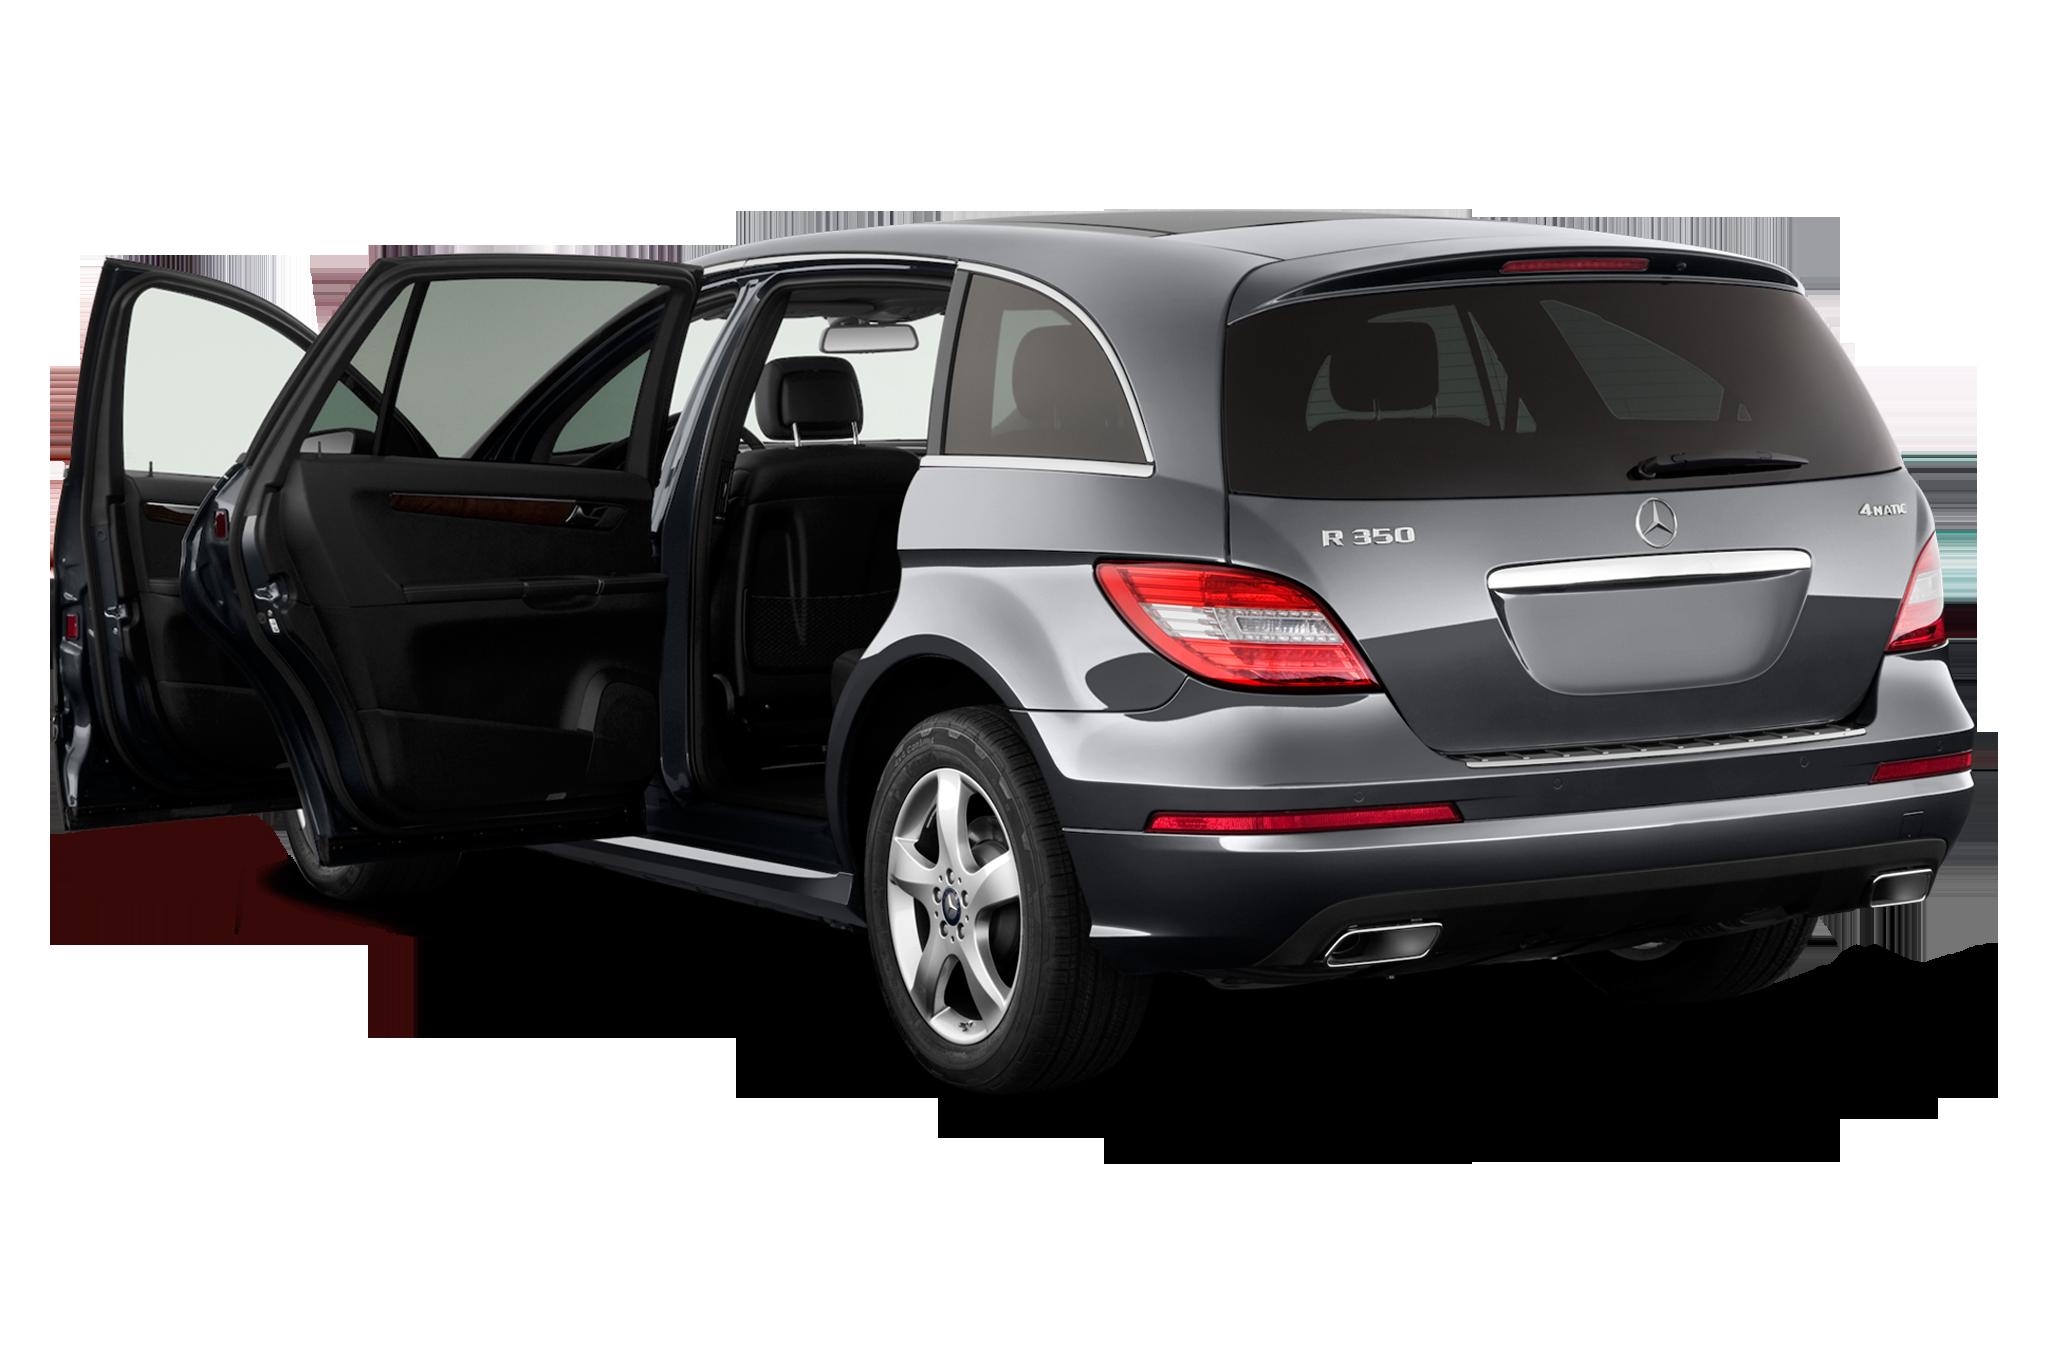 Mercedes benz spending 2 billion to add c class for Mercedes benz alabama